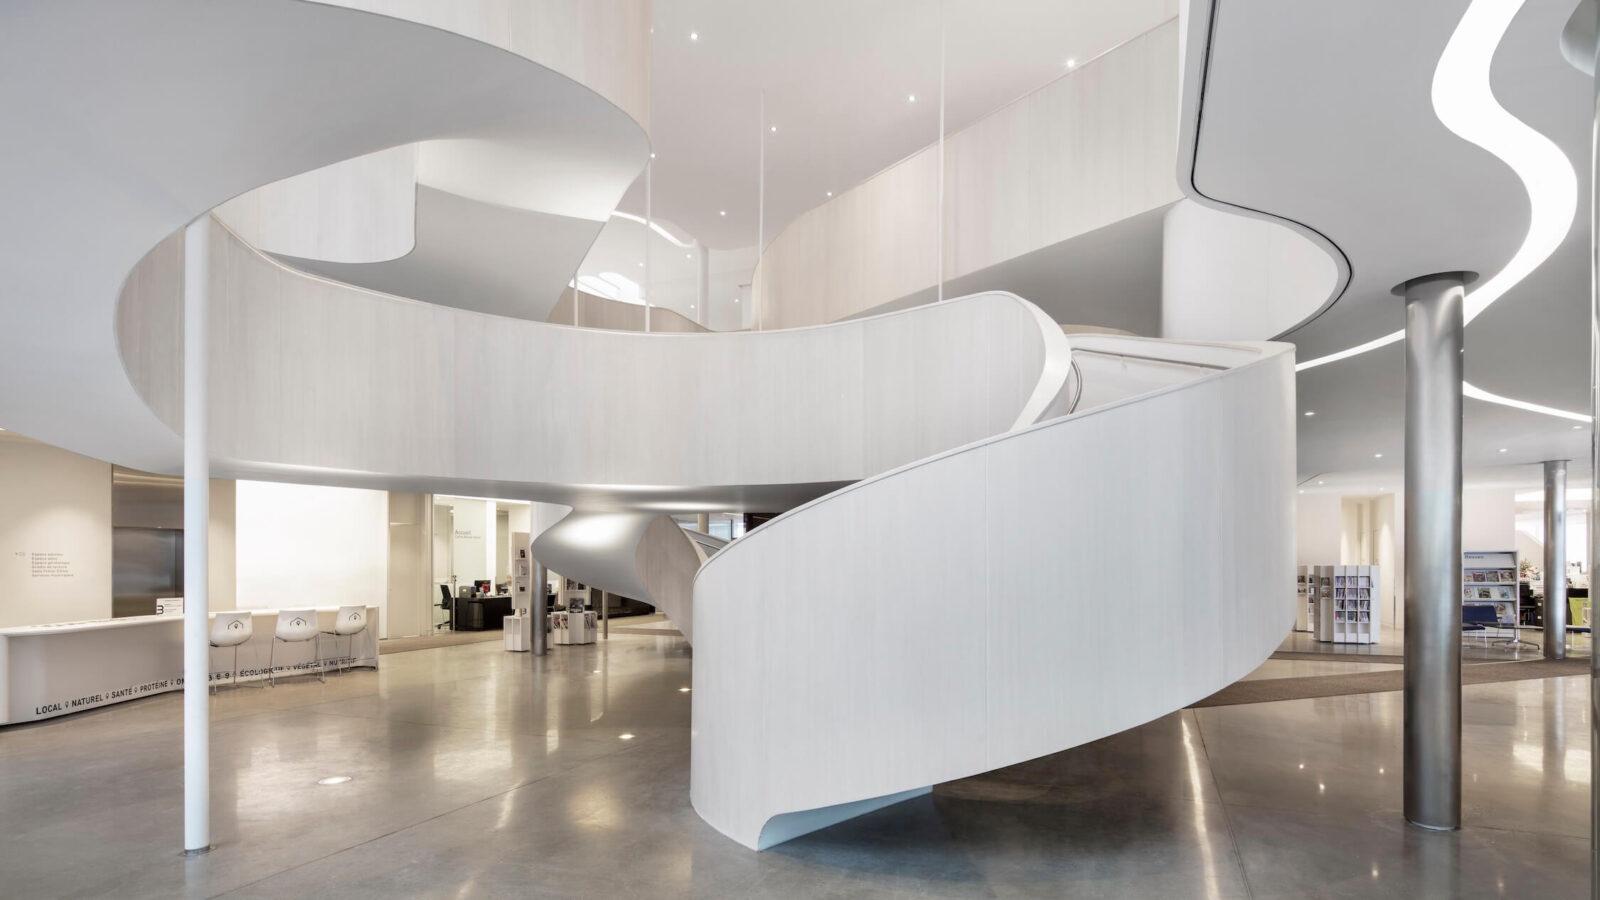 Drummondville Public Library central atrium, designed by Chevalier Morales